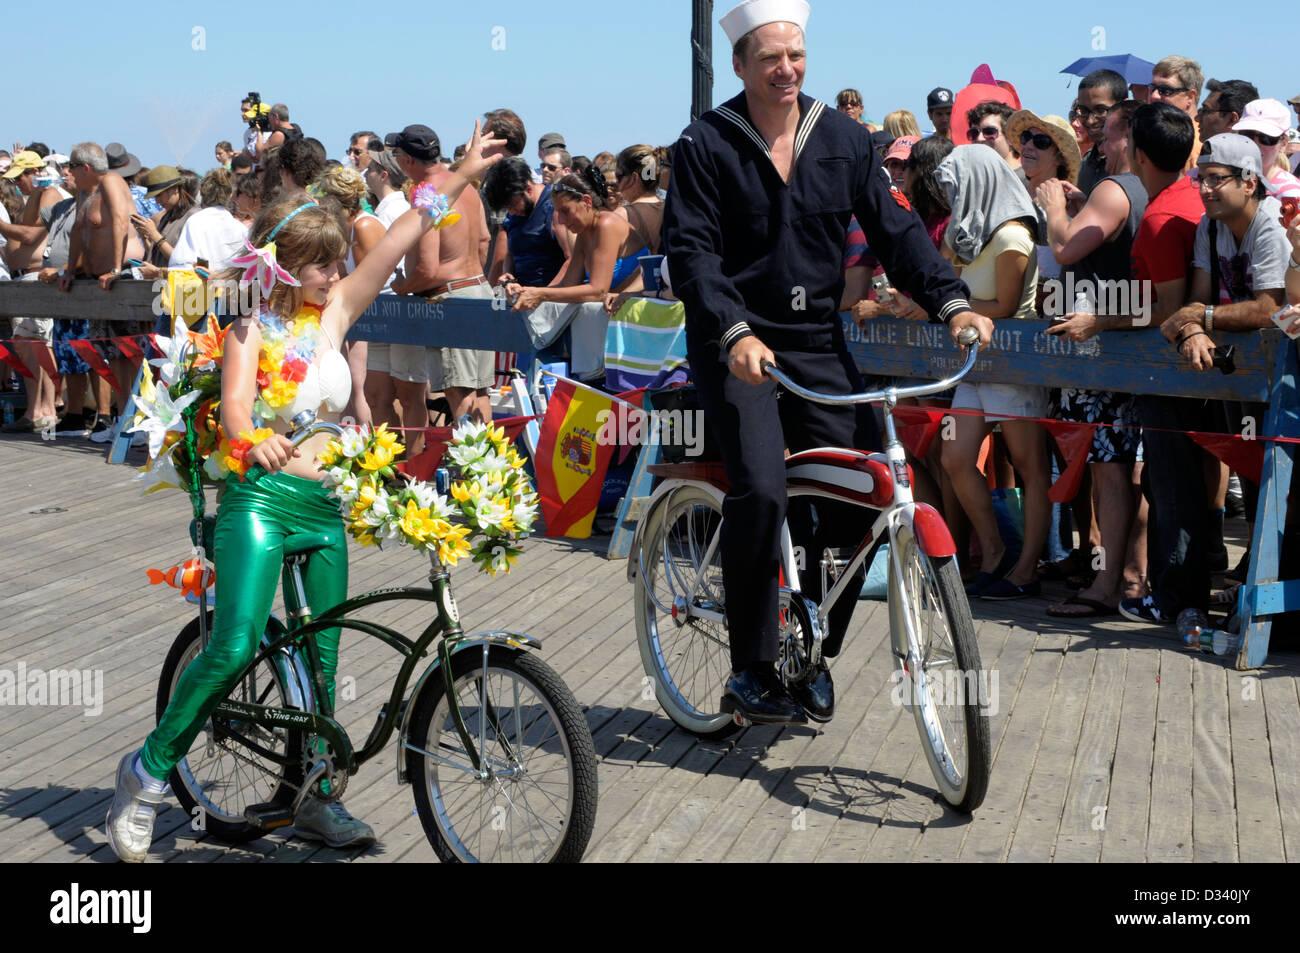 Coney Island Mermaid Parade: The parade pays homage to the Coney Island Mardi Gras parades of the early 20th century. Stock Photo